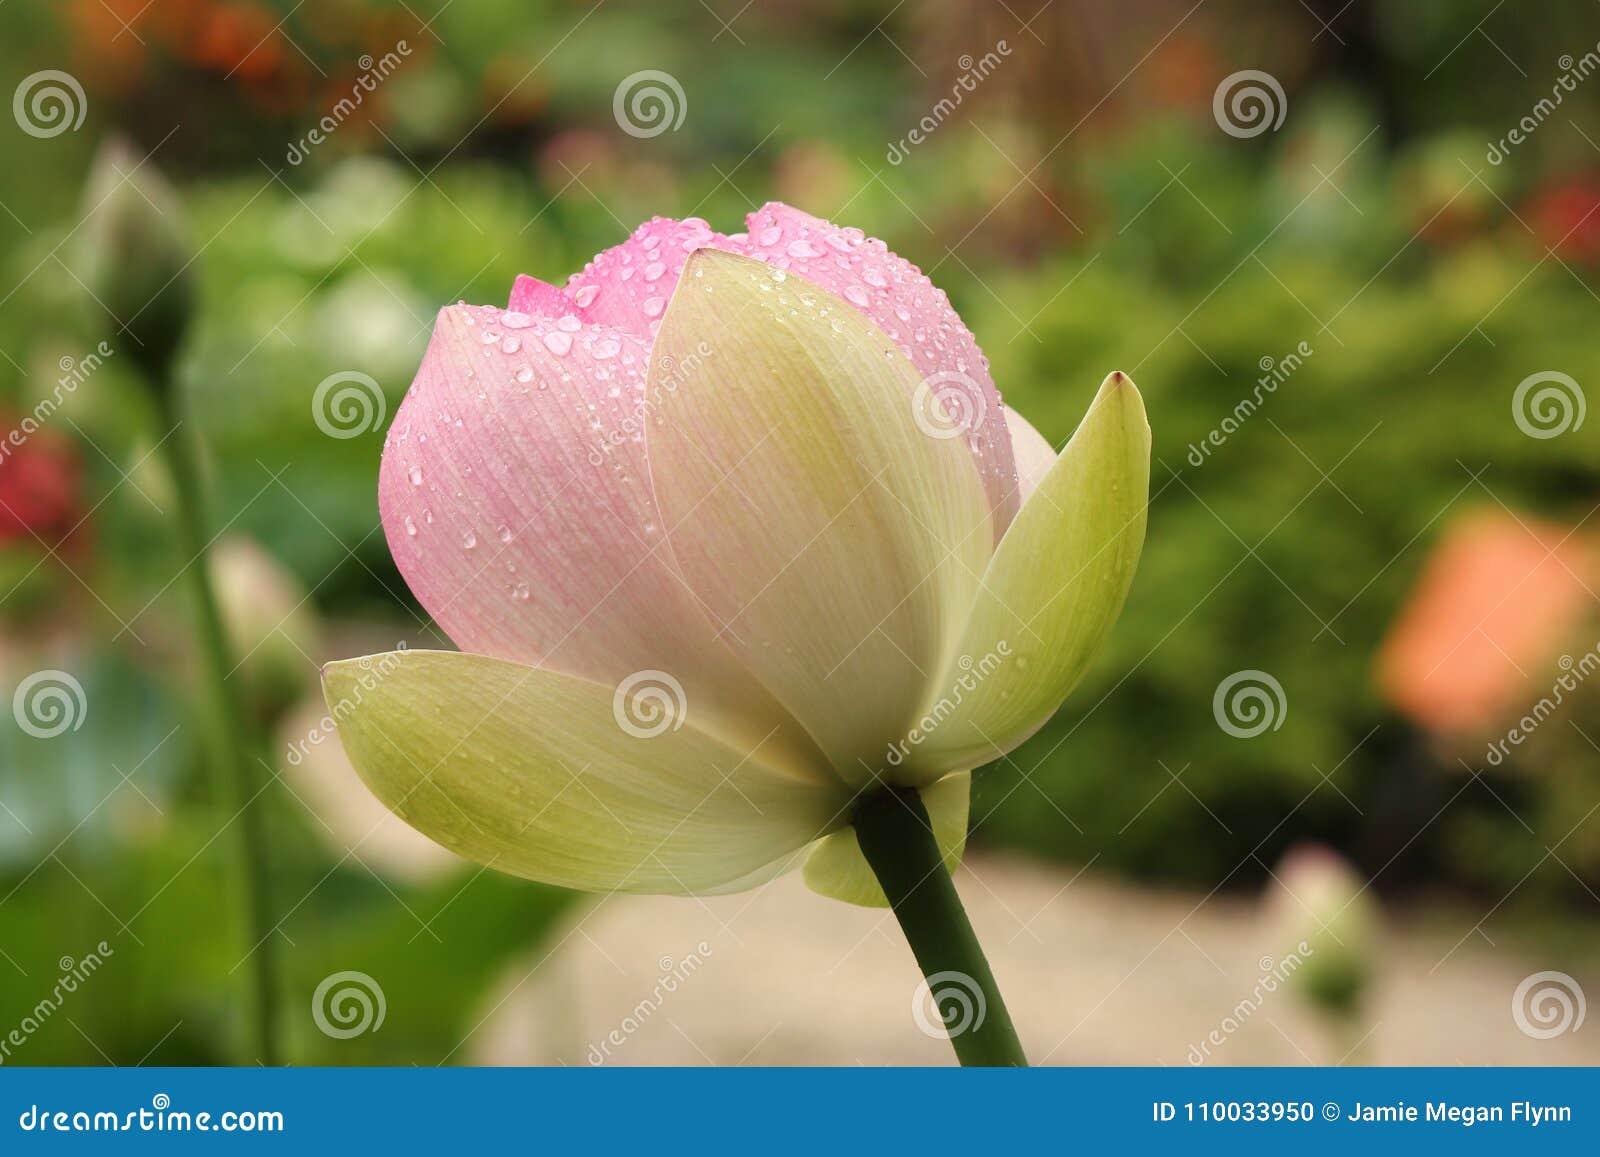 Roze lotusbloembloem met regendruppels